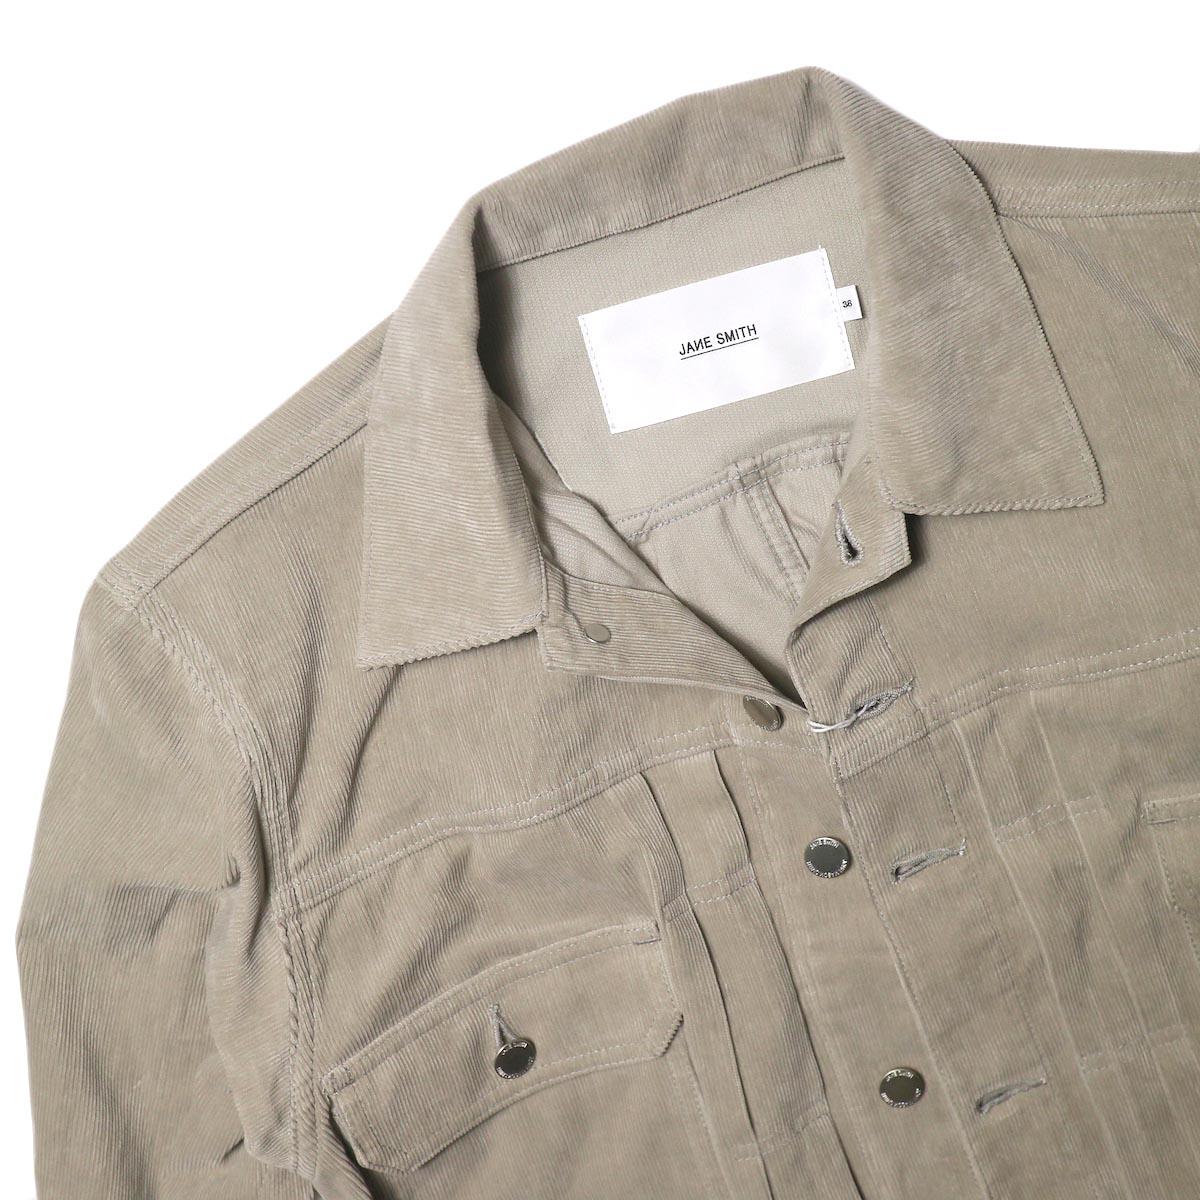 JANE SMITH / TRUCKER JACKET (fawn beige) 襟